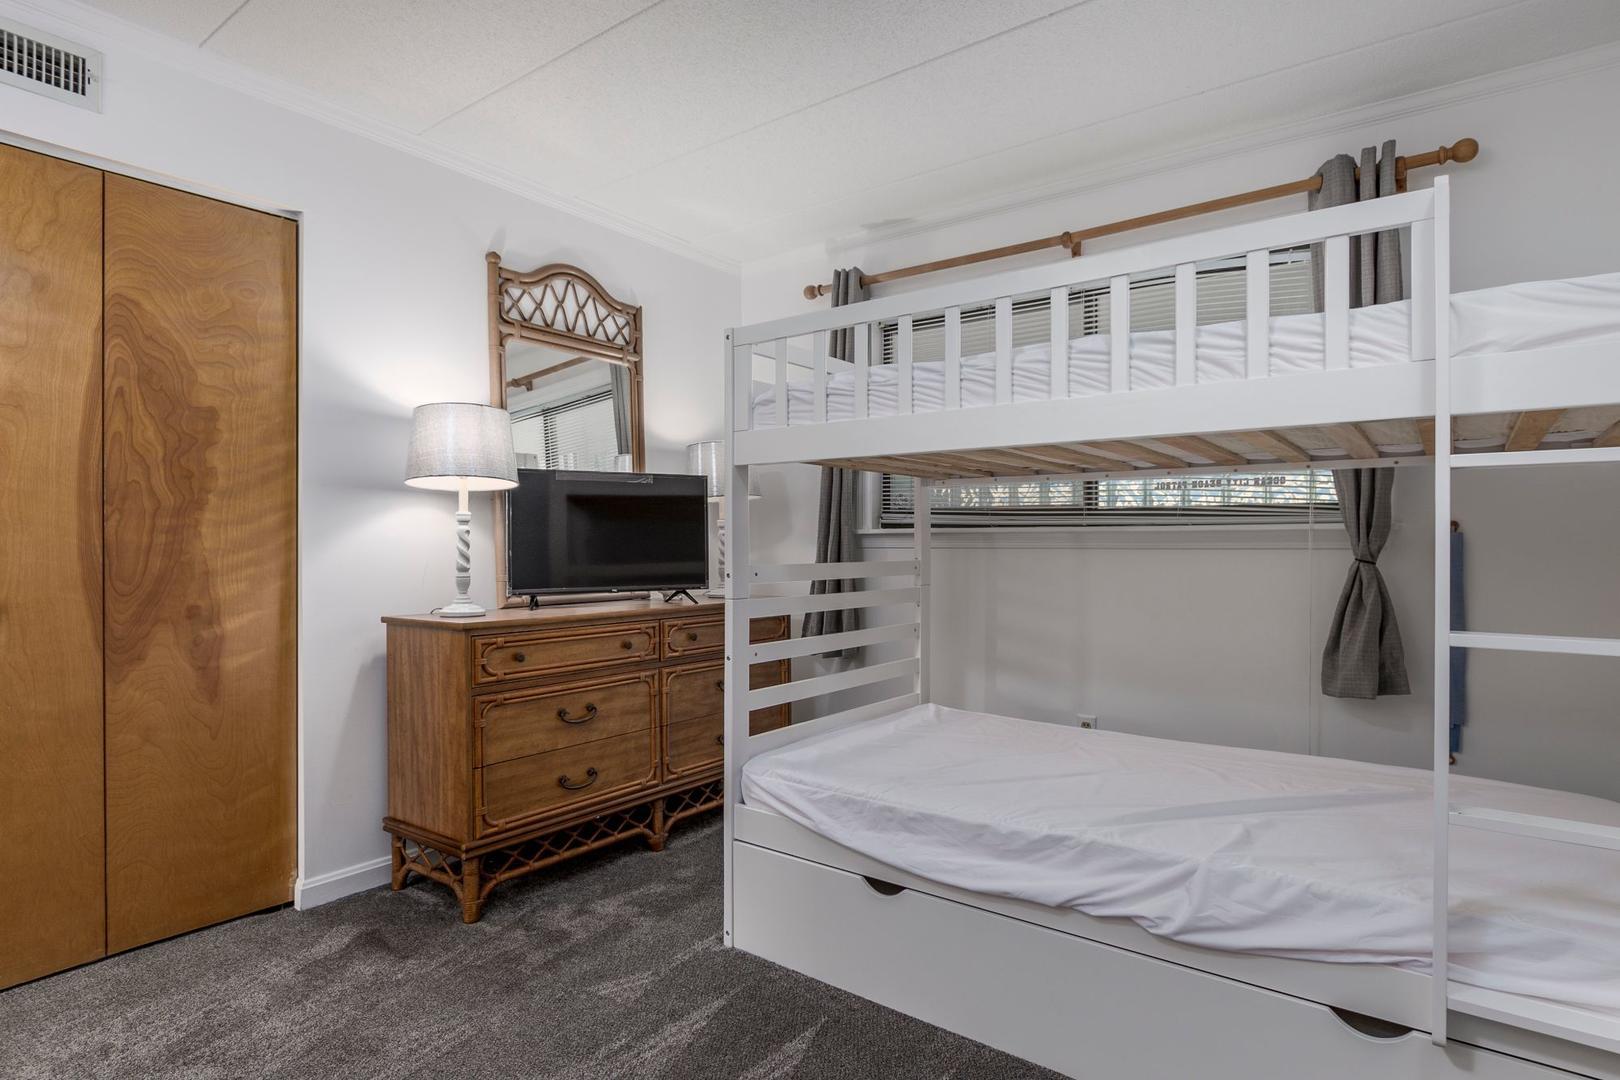 Amber Waves 101 - Bedroom 2